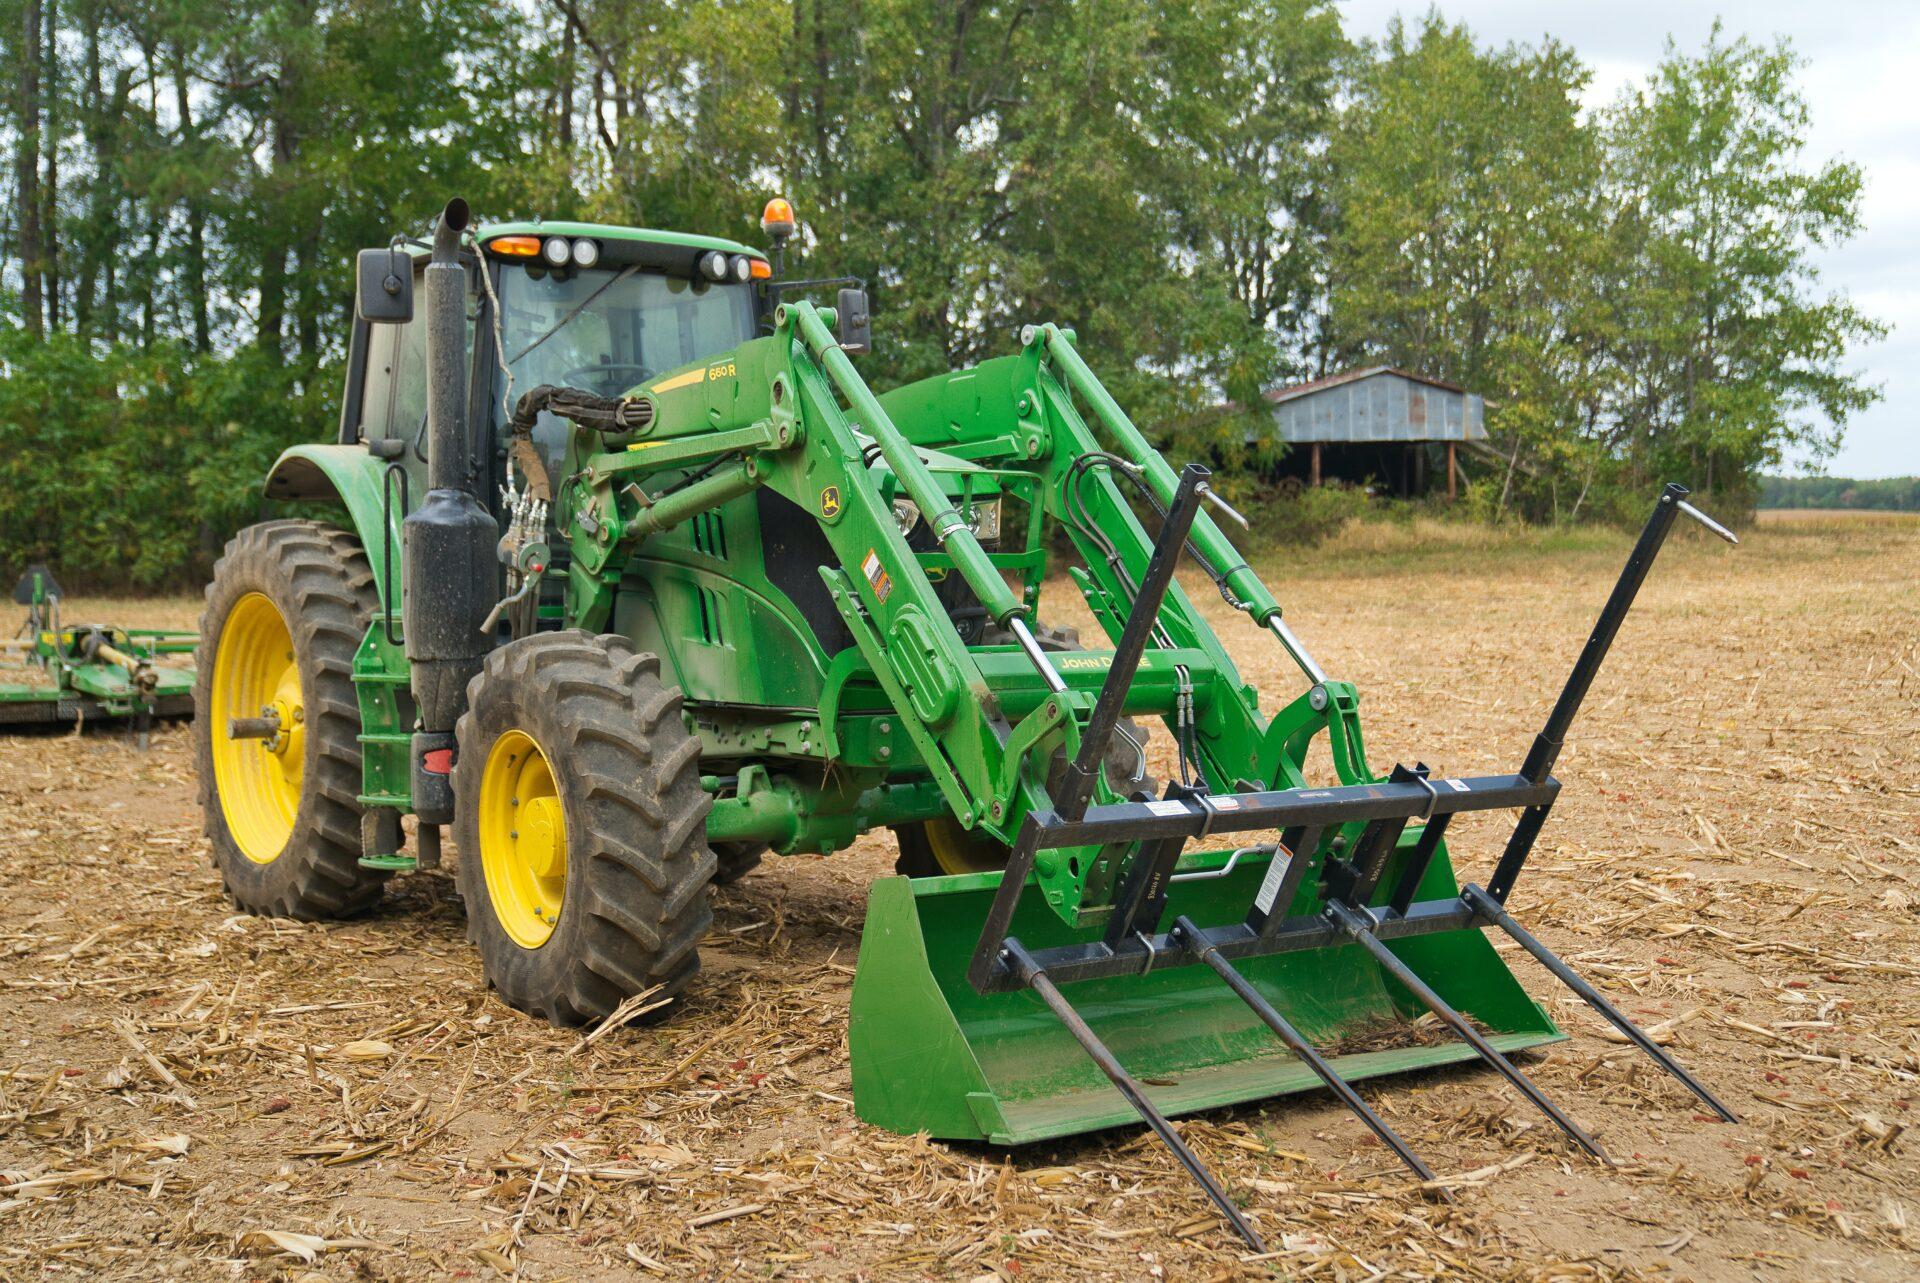 The Best Farm Insurance for 2021